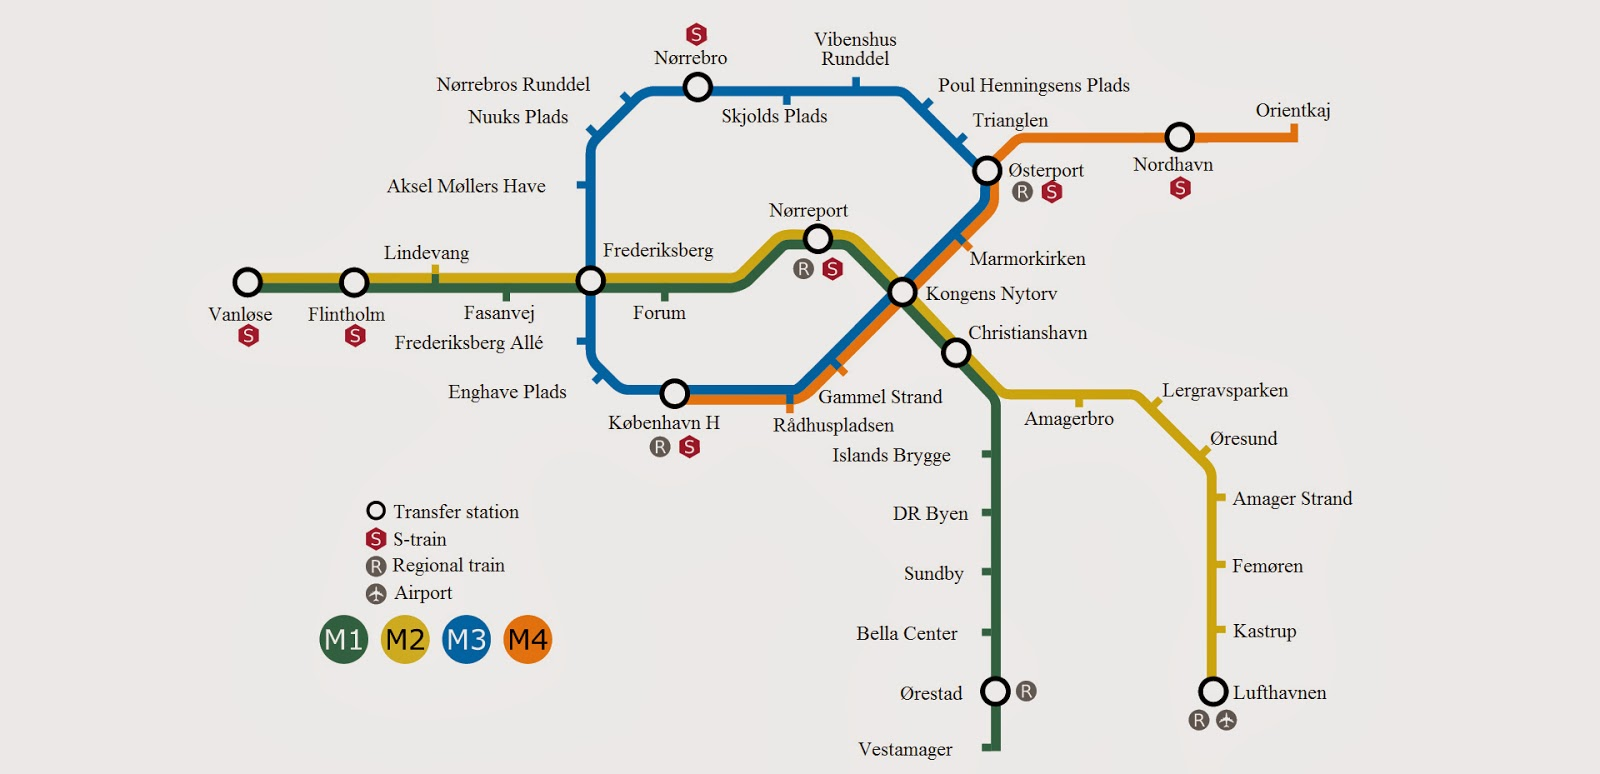 Plano de metro de Copenhague